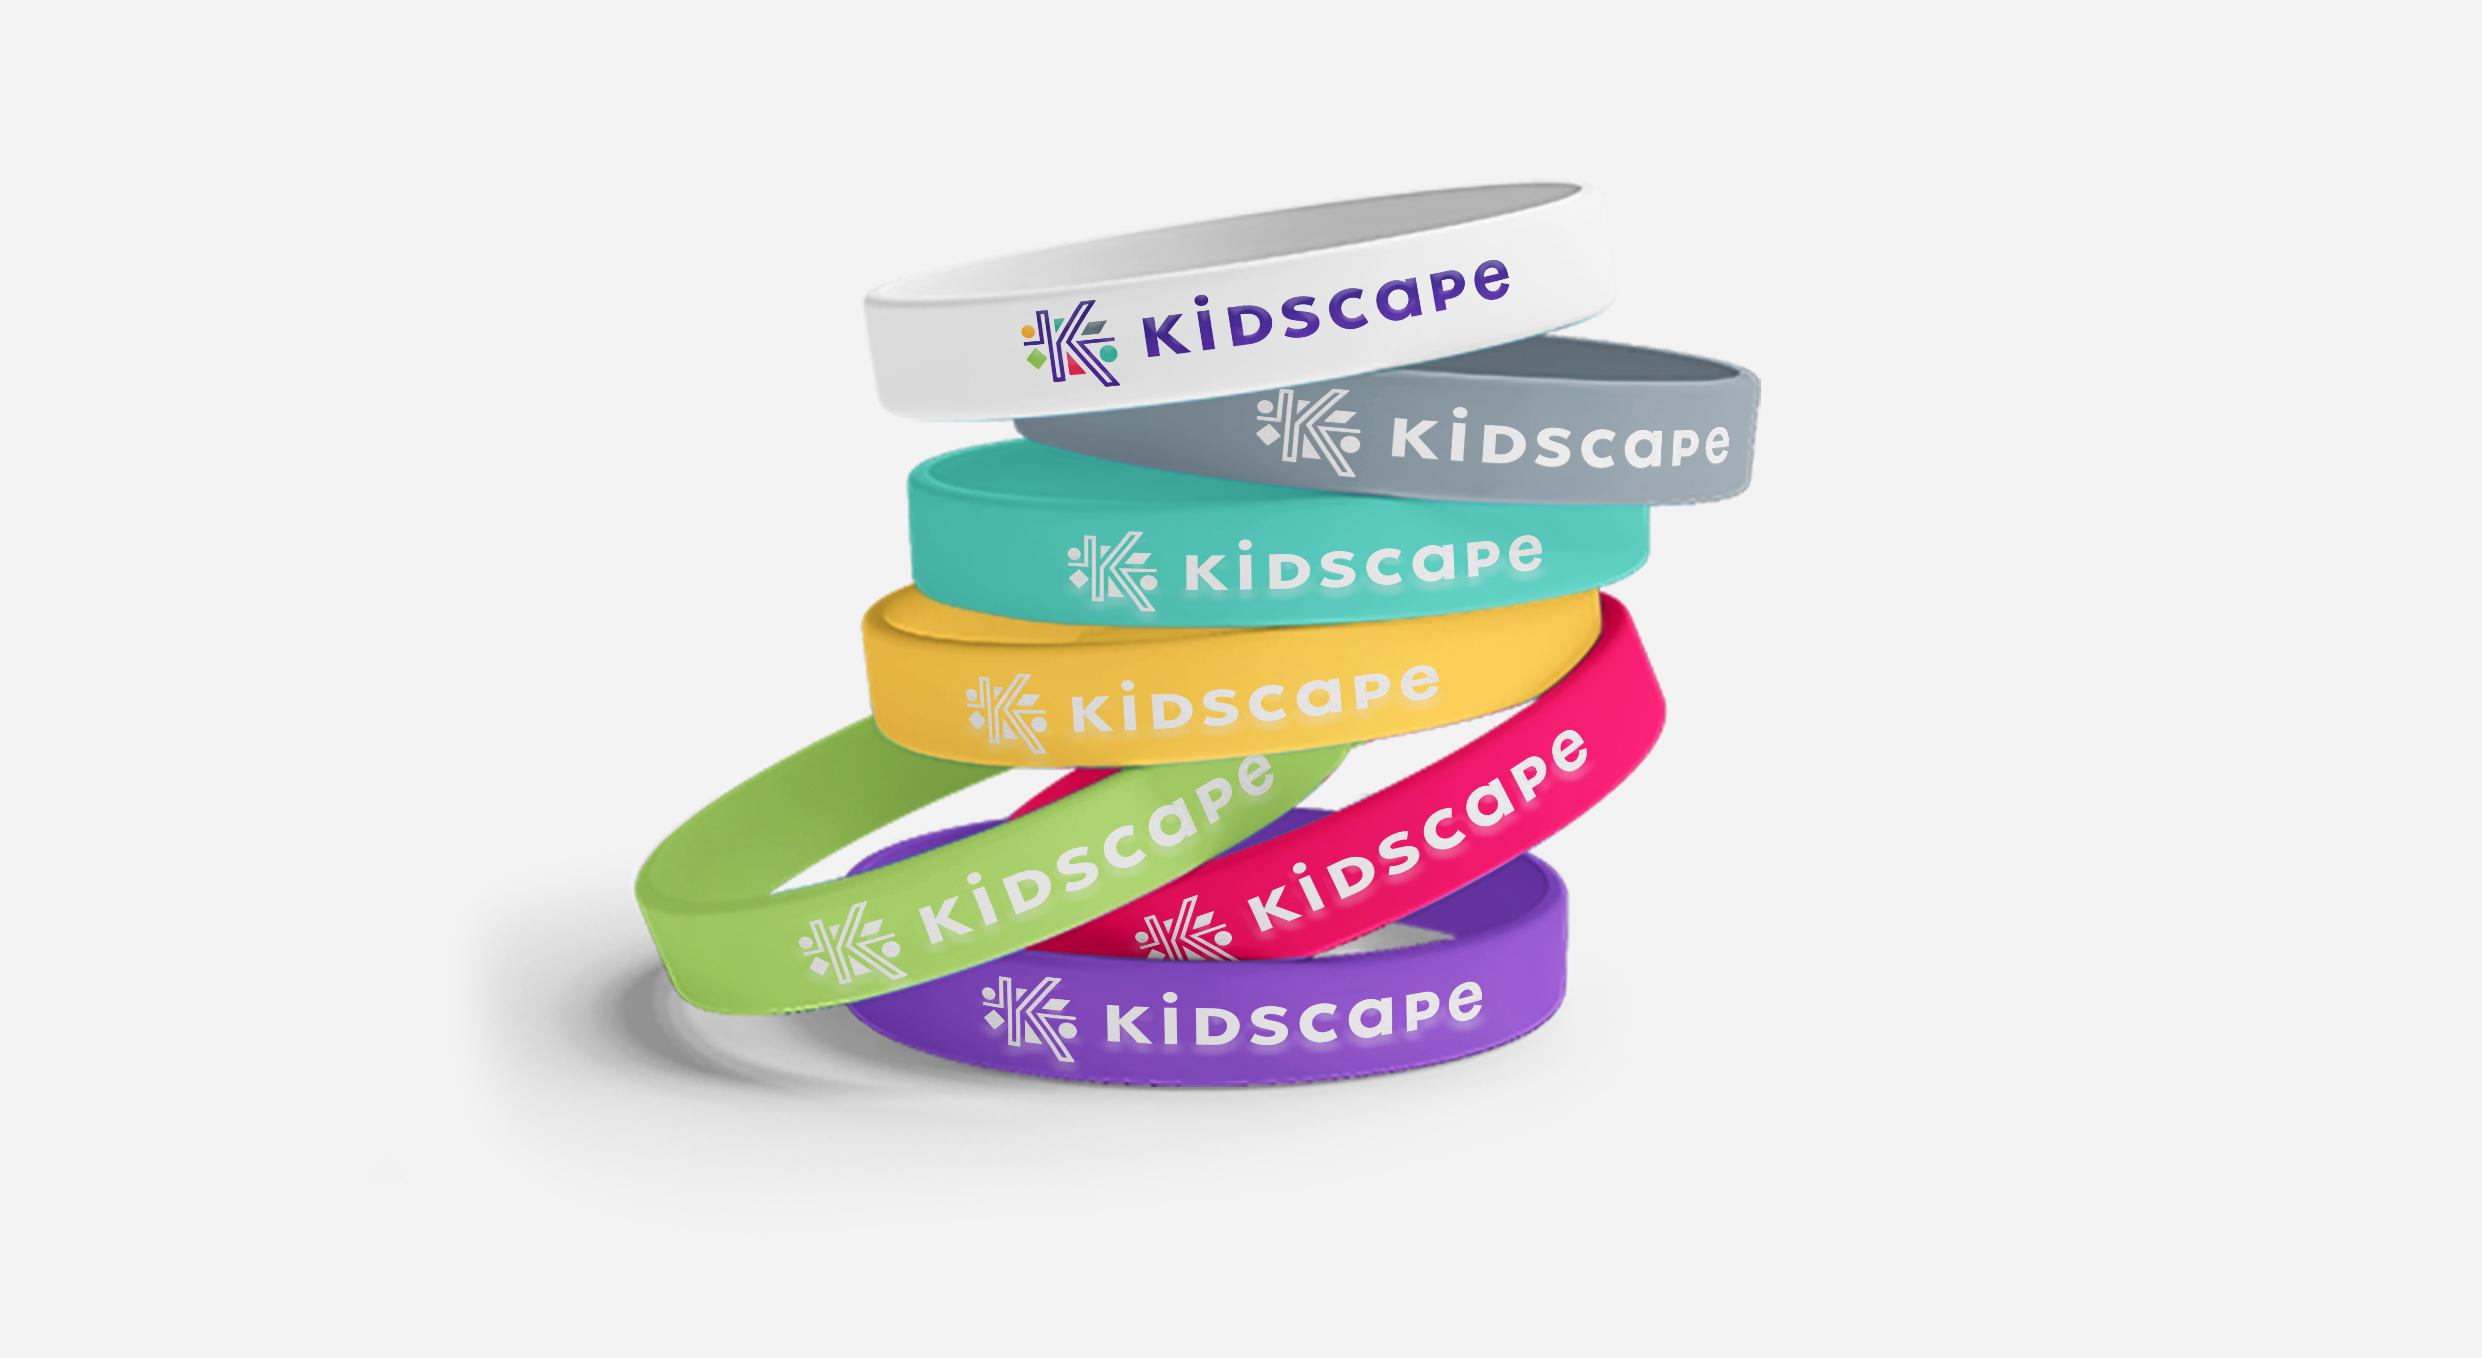 Kidscape_Wristbands_MockUP_v02.jpg